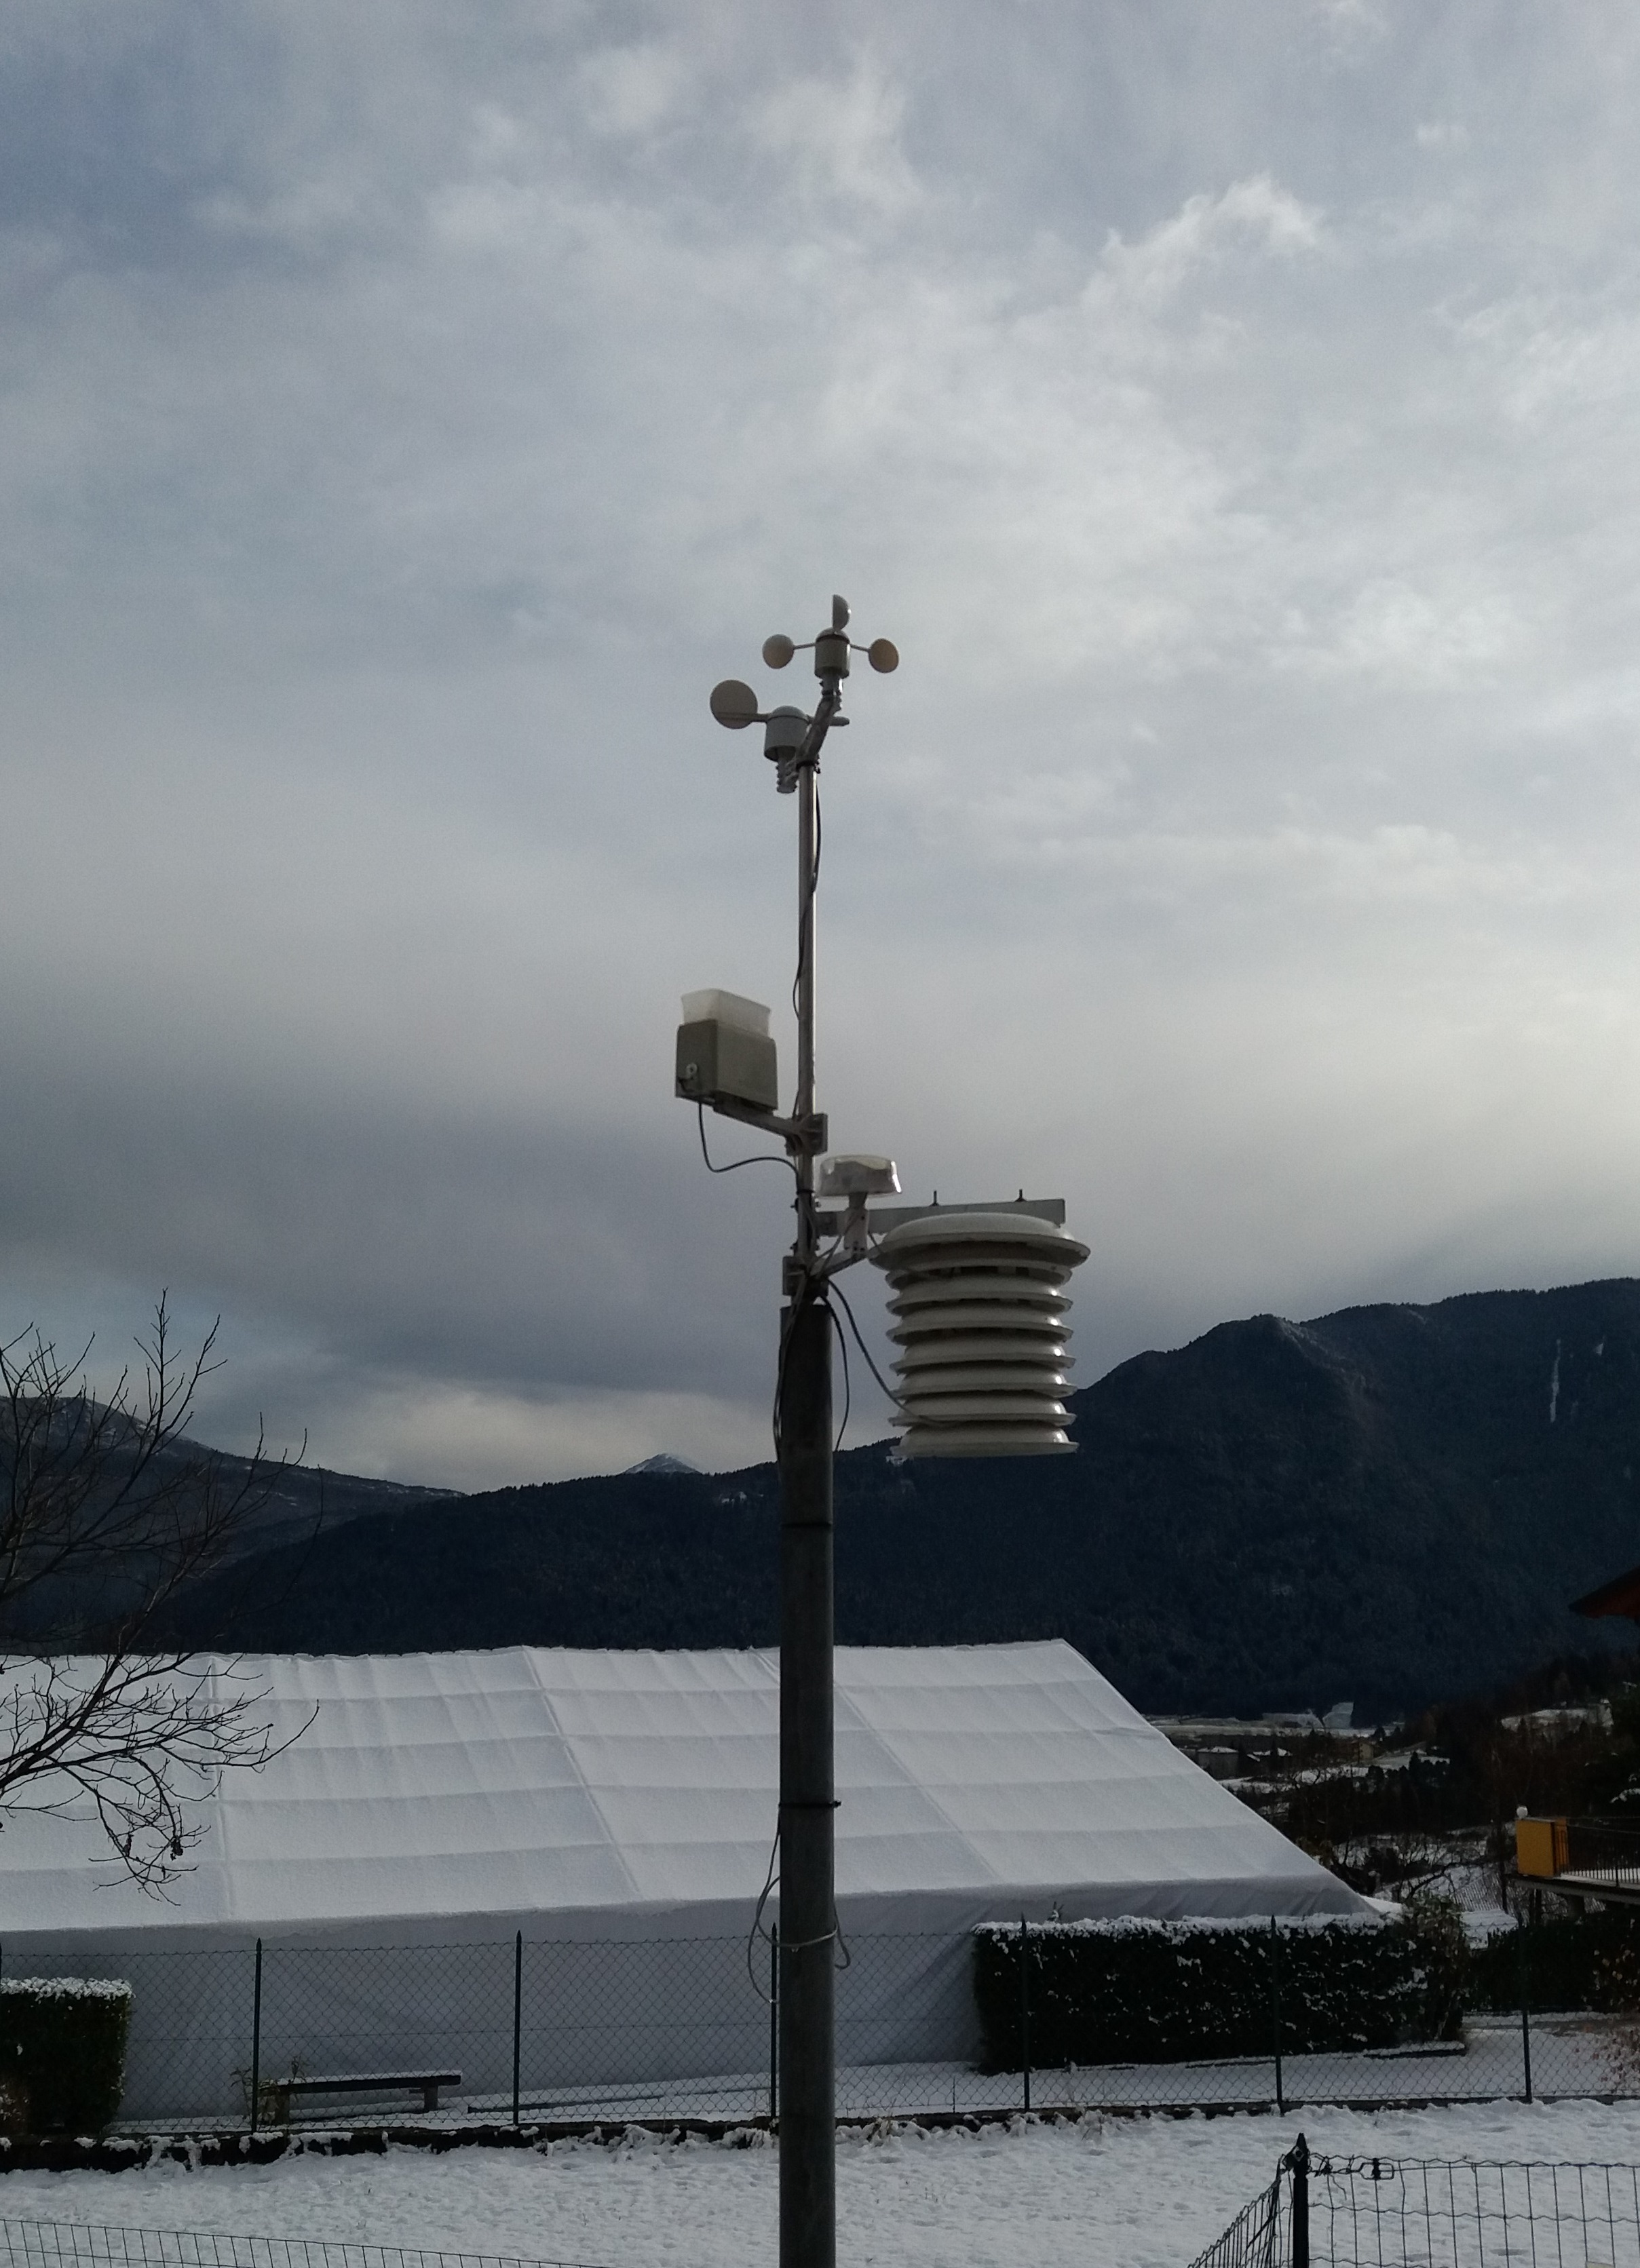 Stazione meteorologica di Balbido - PCE FWS 20